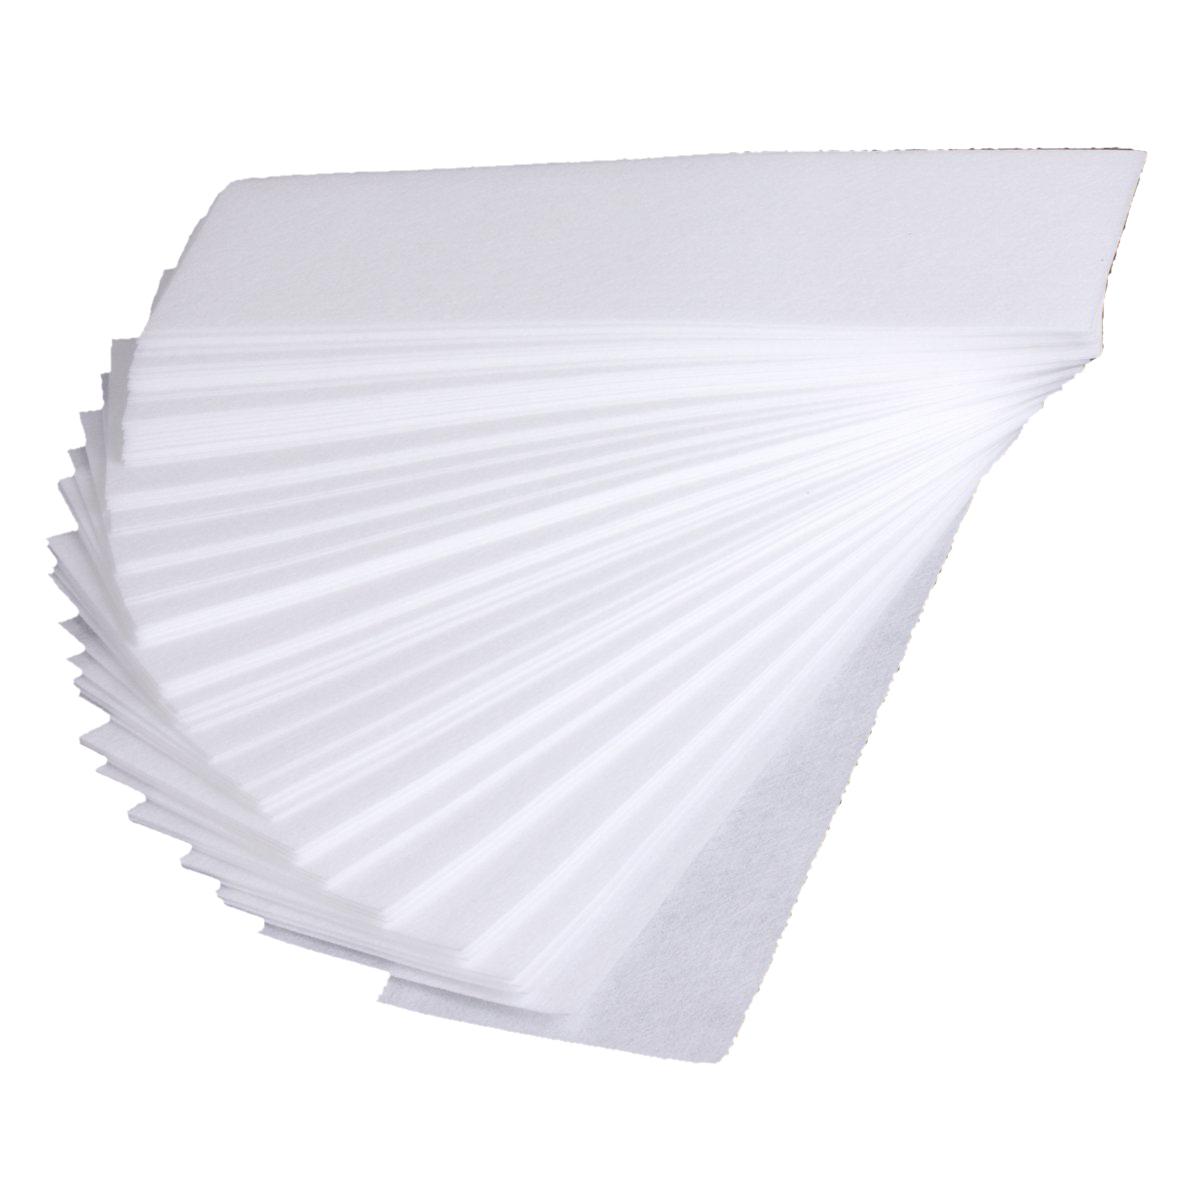 epilation a la jambe bande cire papier de l 39 epilation non tissee blanche 20 7cm ebay. Black Bedroom Furniture Sets. Home Design Ideas